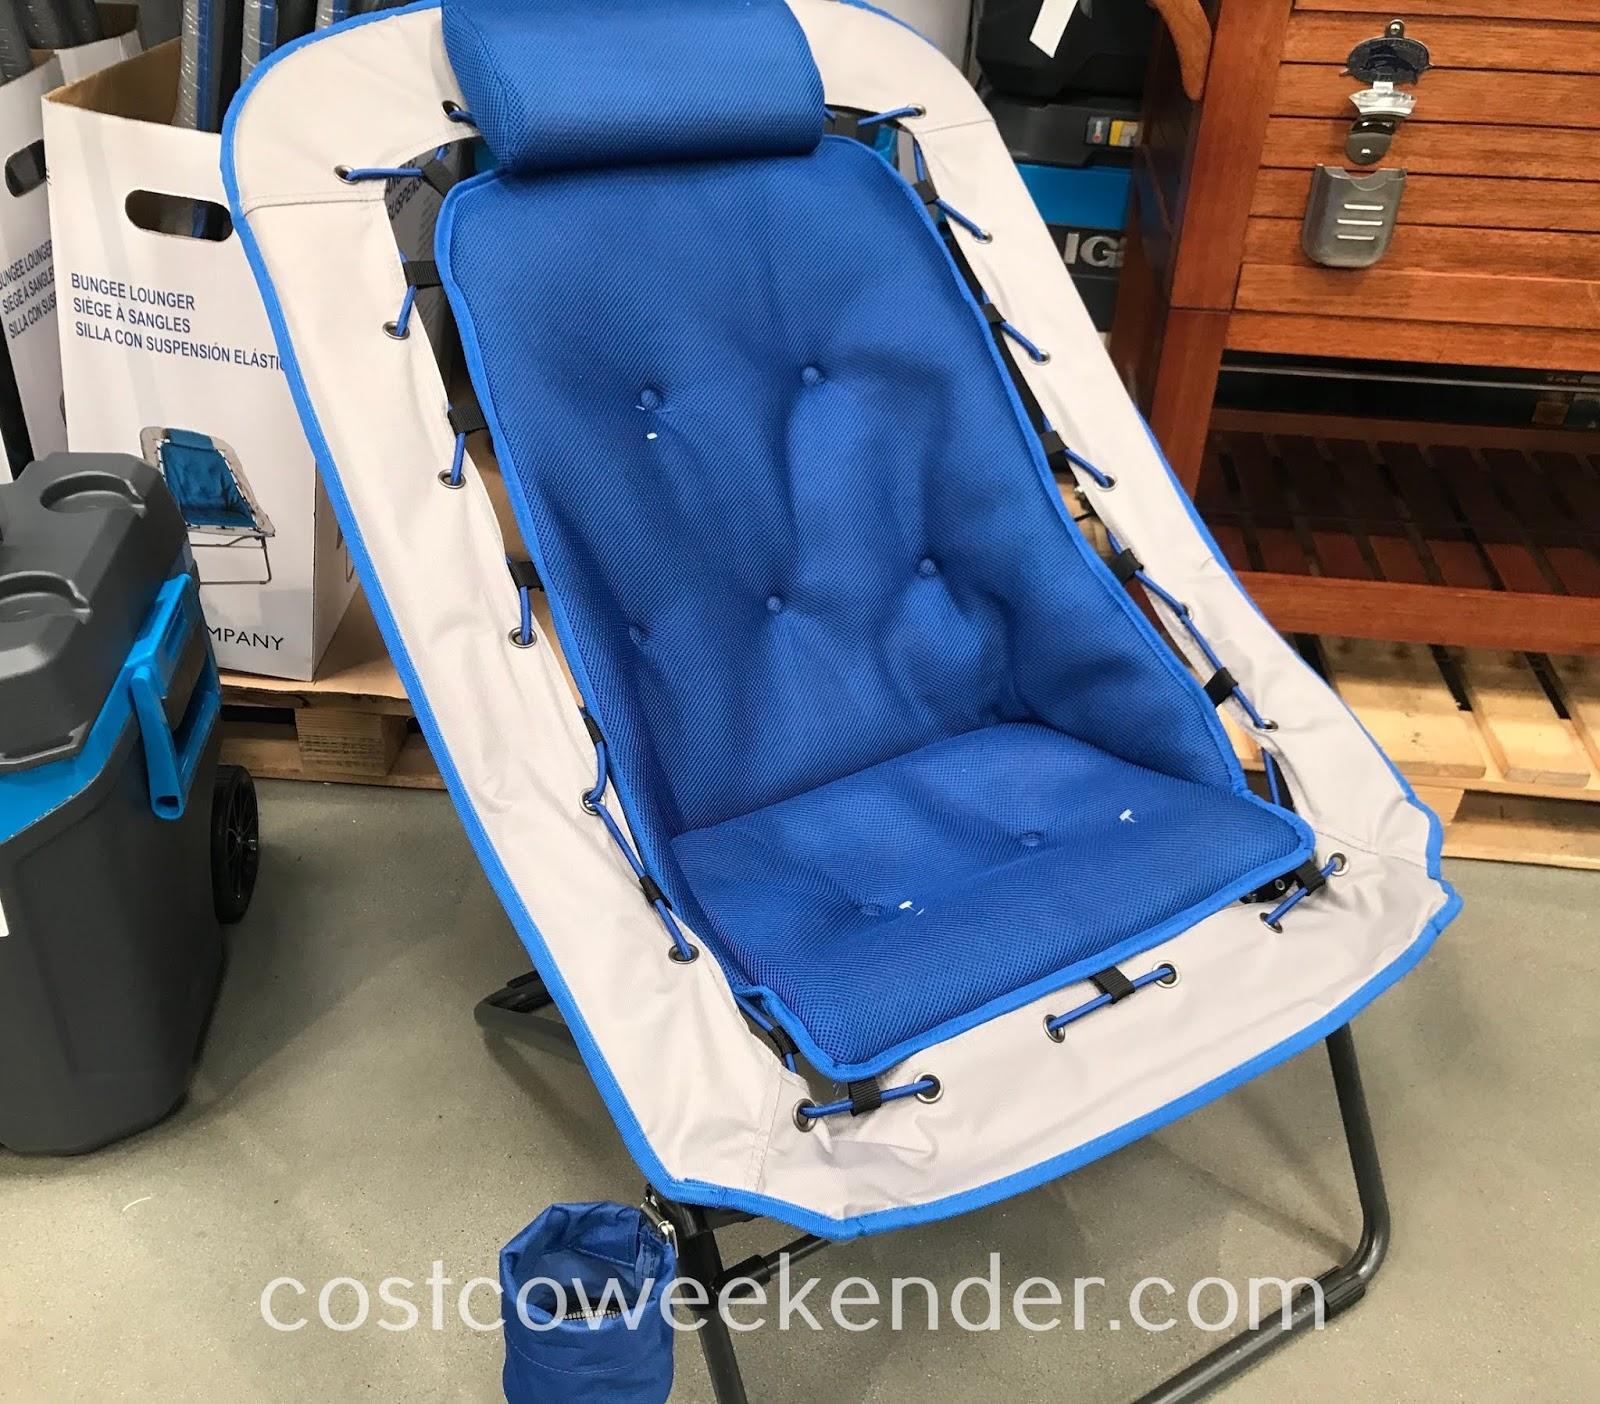 Z Company Bungee Lounger Costco Weekender